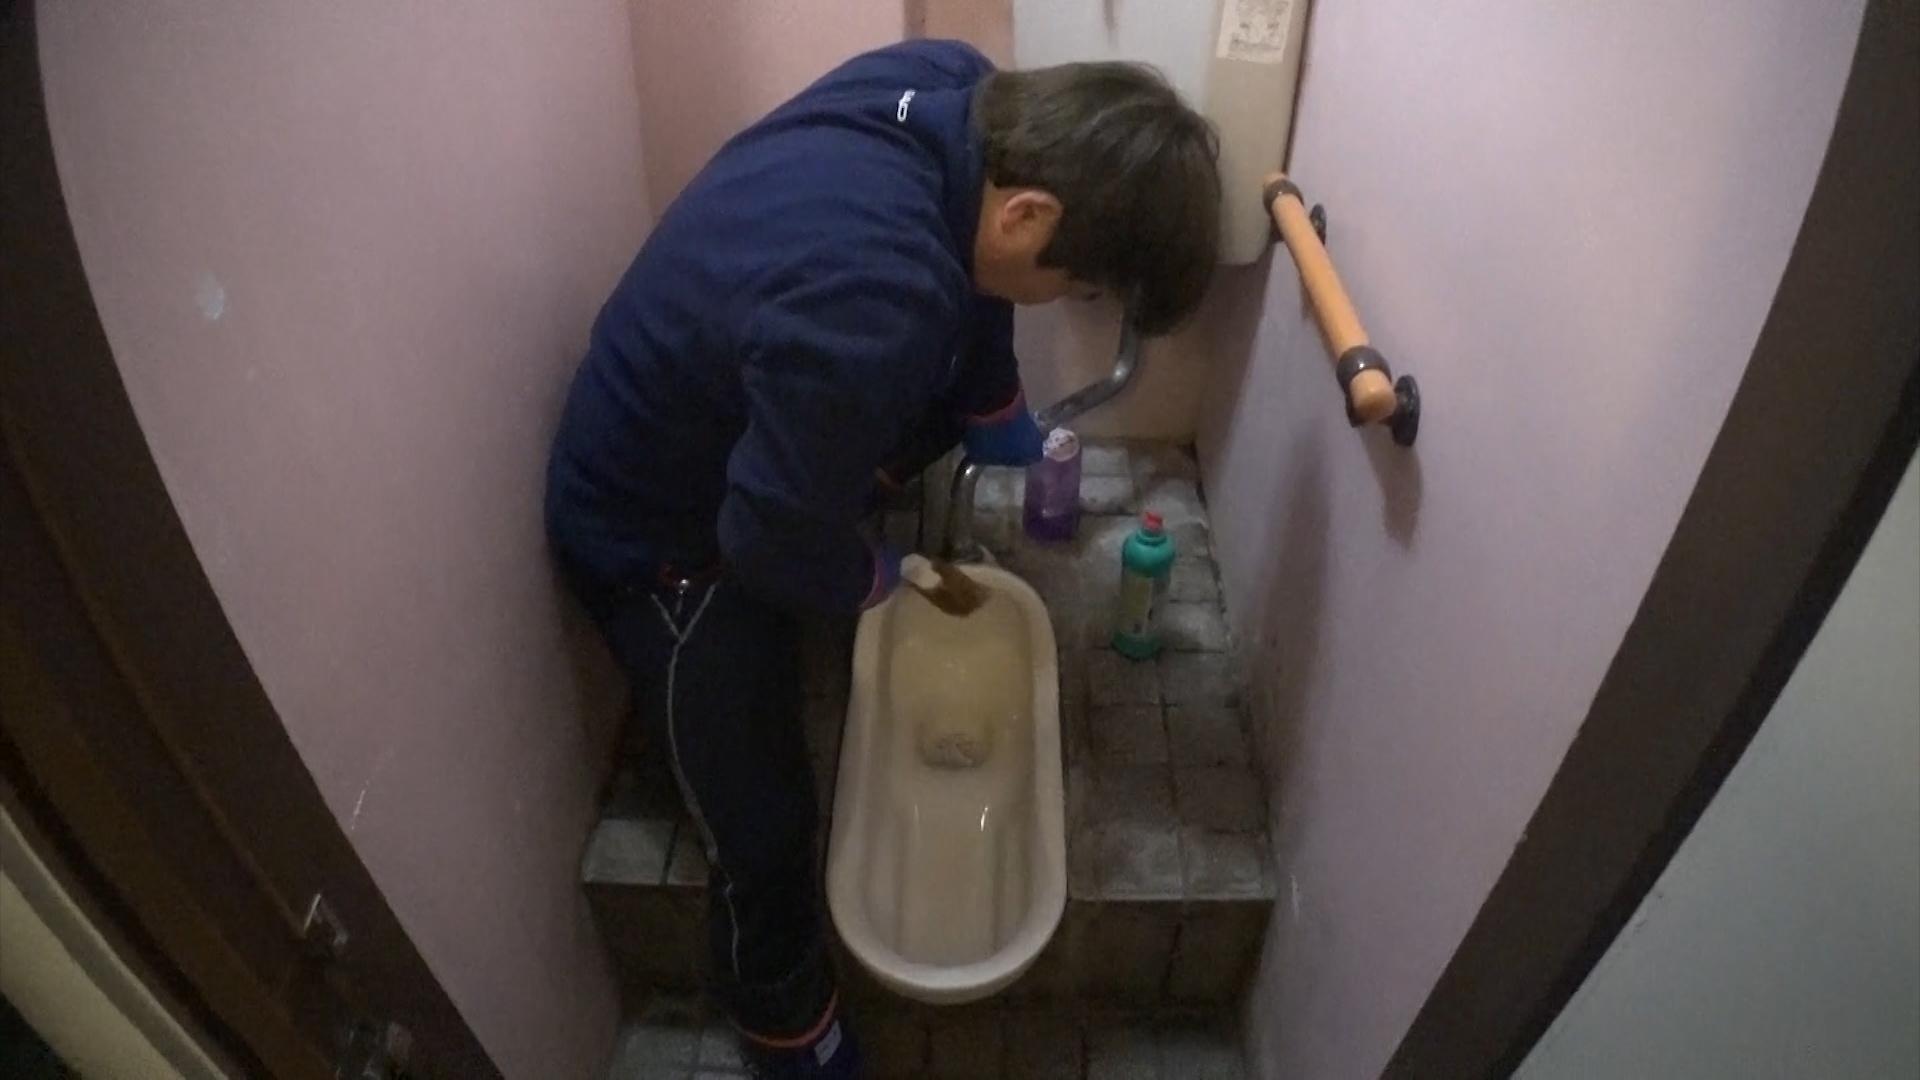 [MBC 다큐스페셜] 배우 정은표, 온천마을 화장실 청소하며 '생존기' 이미지-1